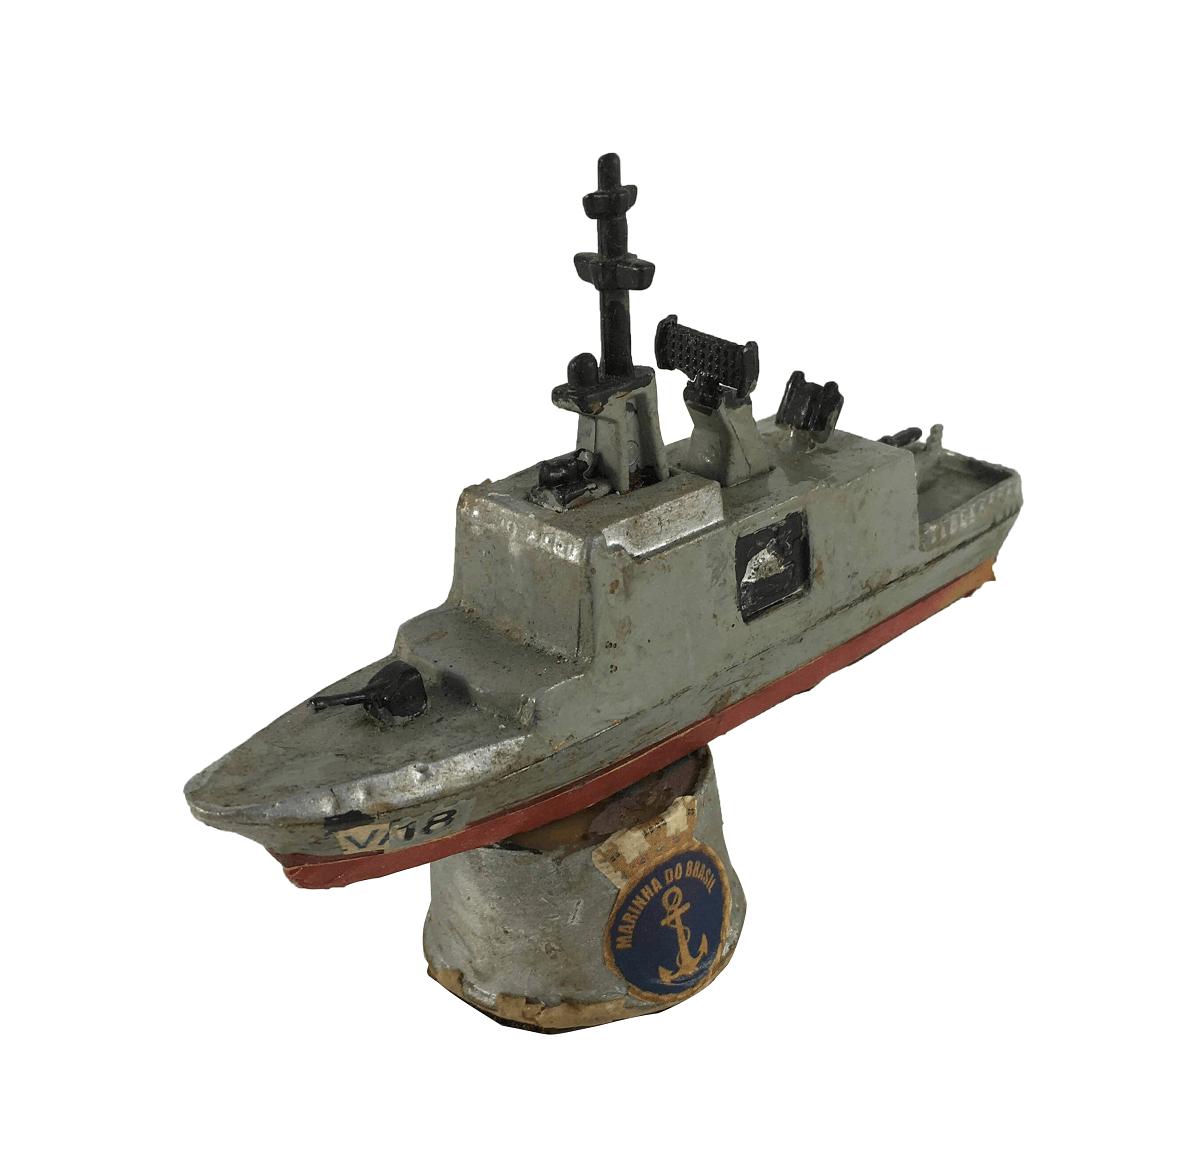 Antiga Miniatura Navio Militar V18